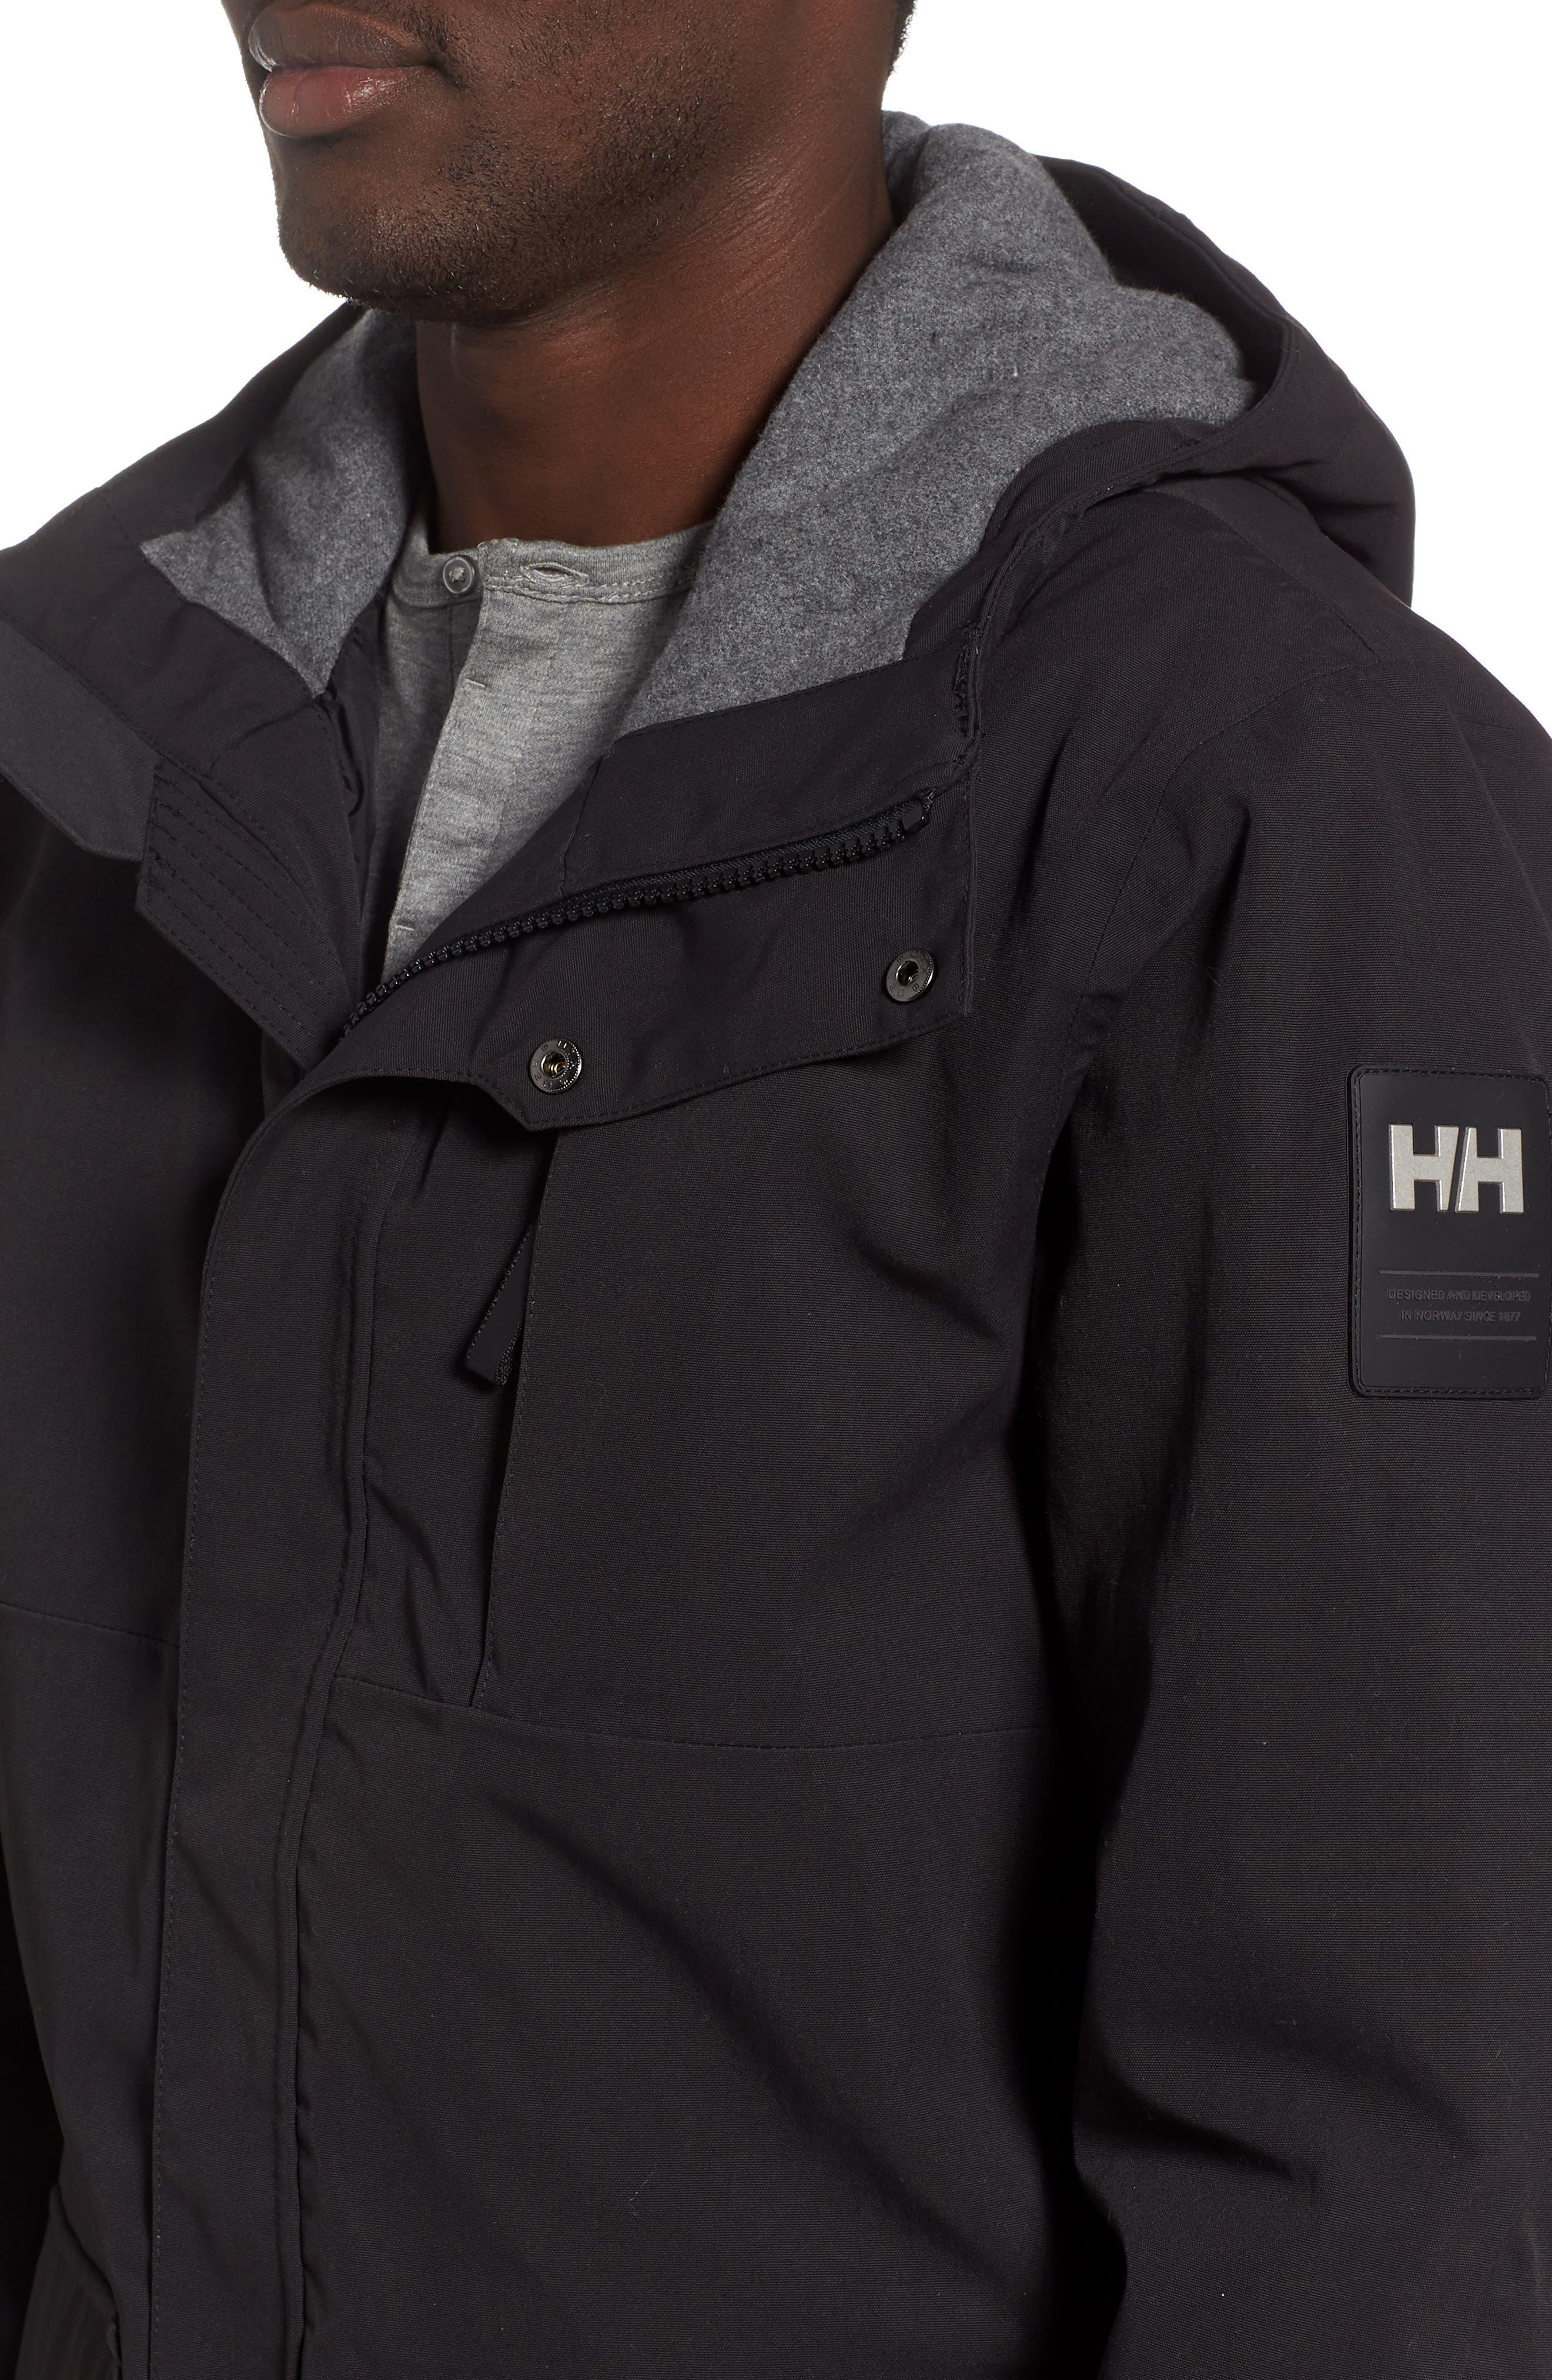 Urban Windproof & Waterproof Primaloft<sup>®</sup> Long Jacket,                             Alternate thumbnail 4, color,                             BLACK